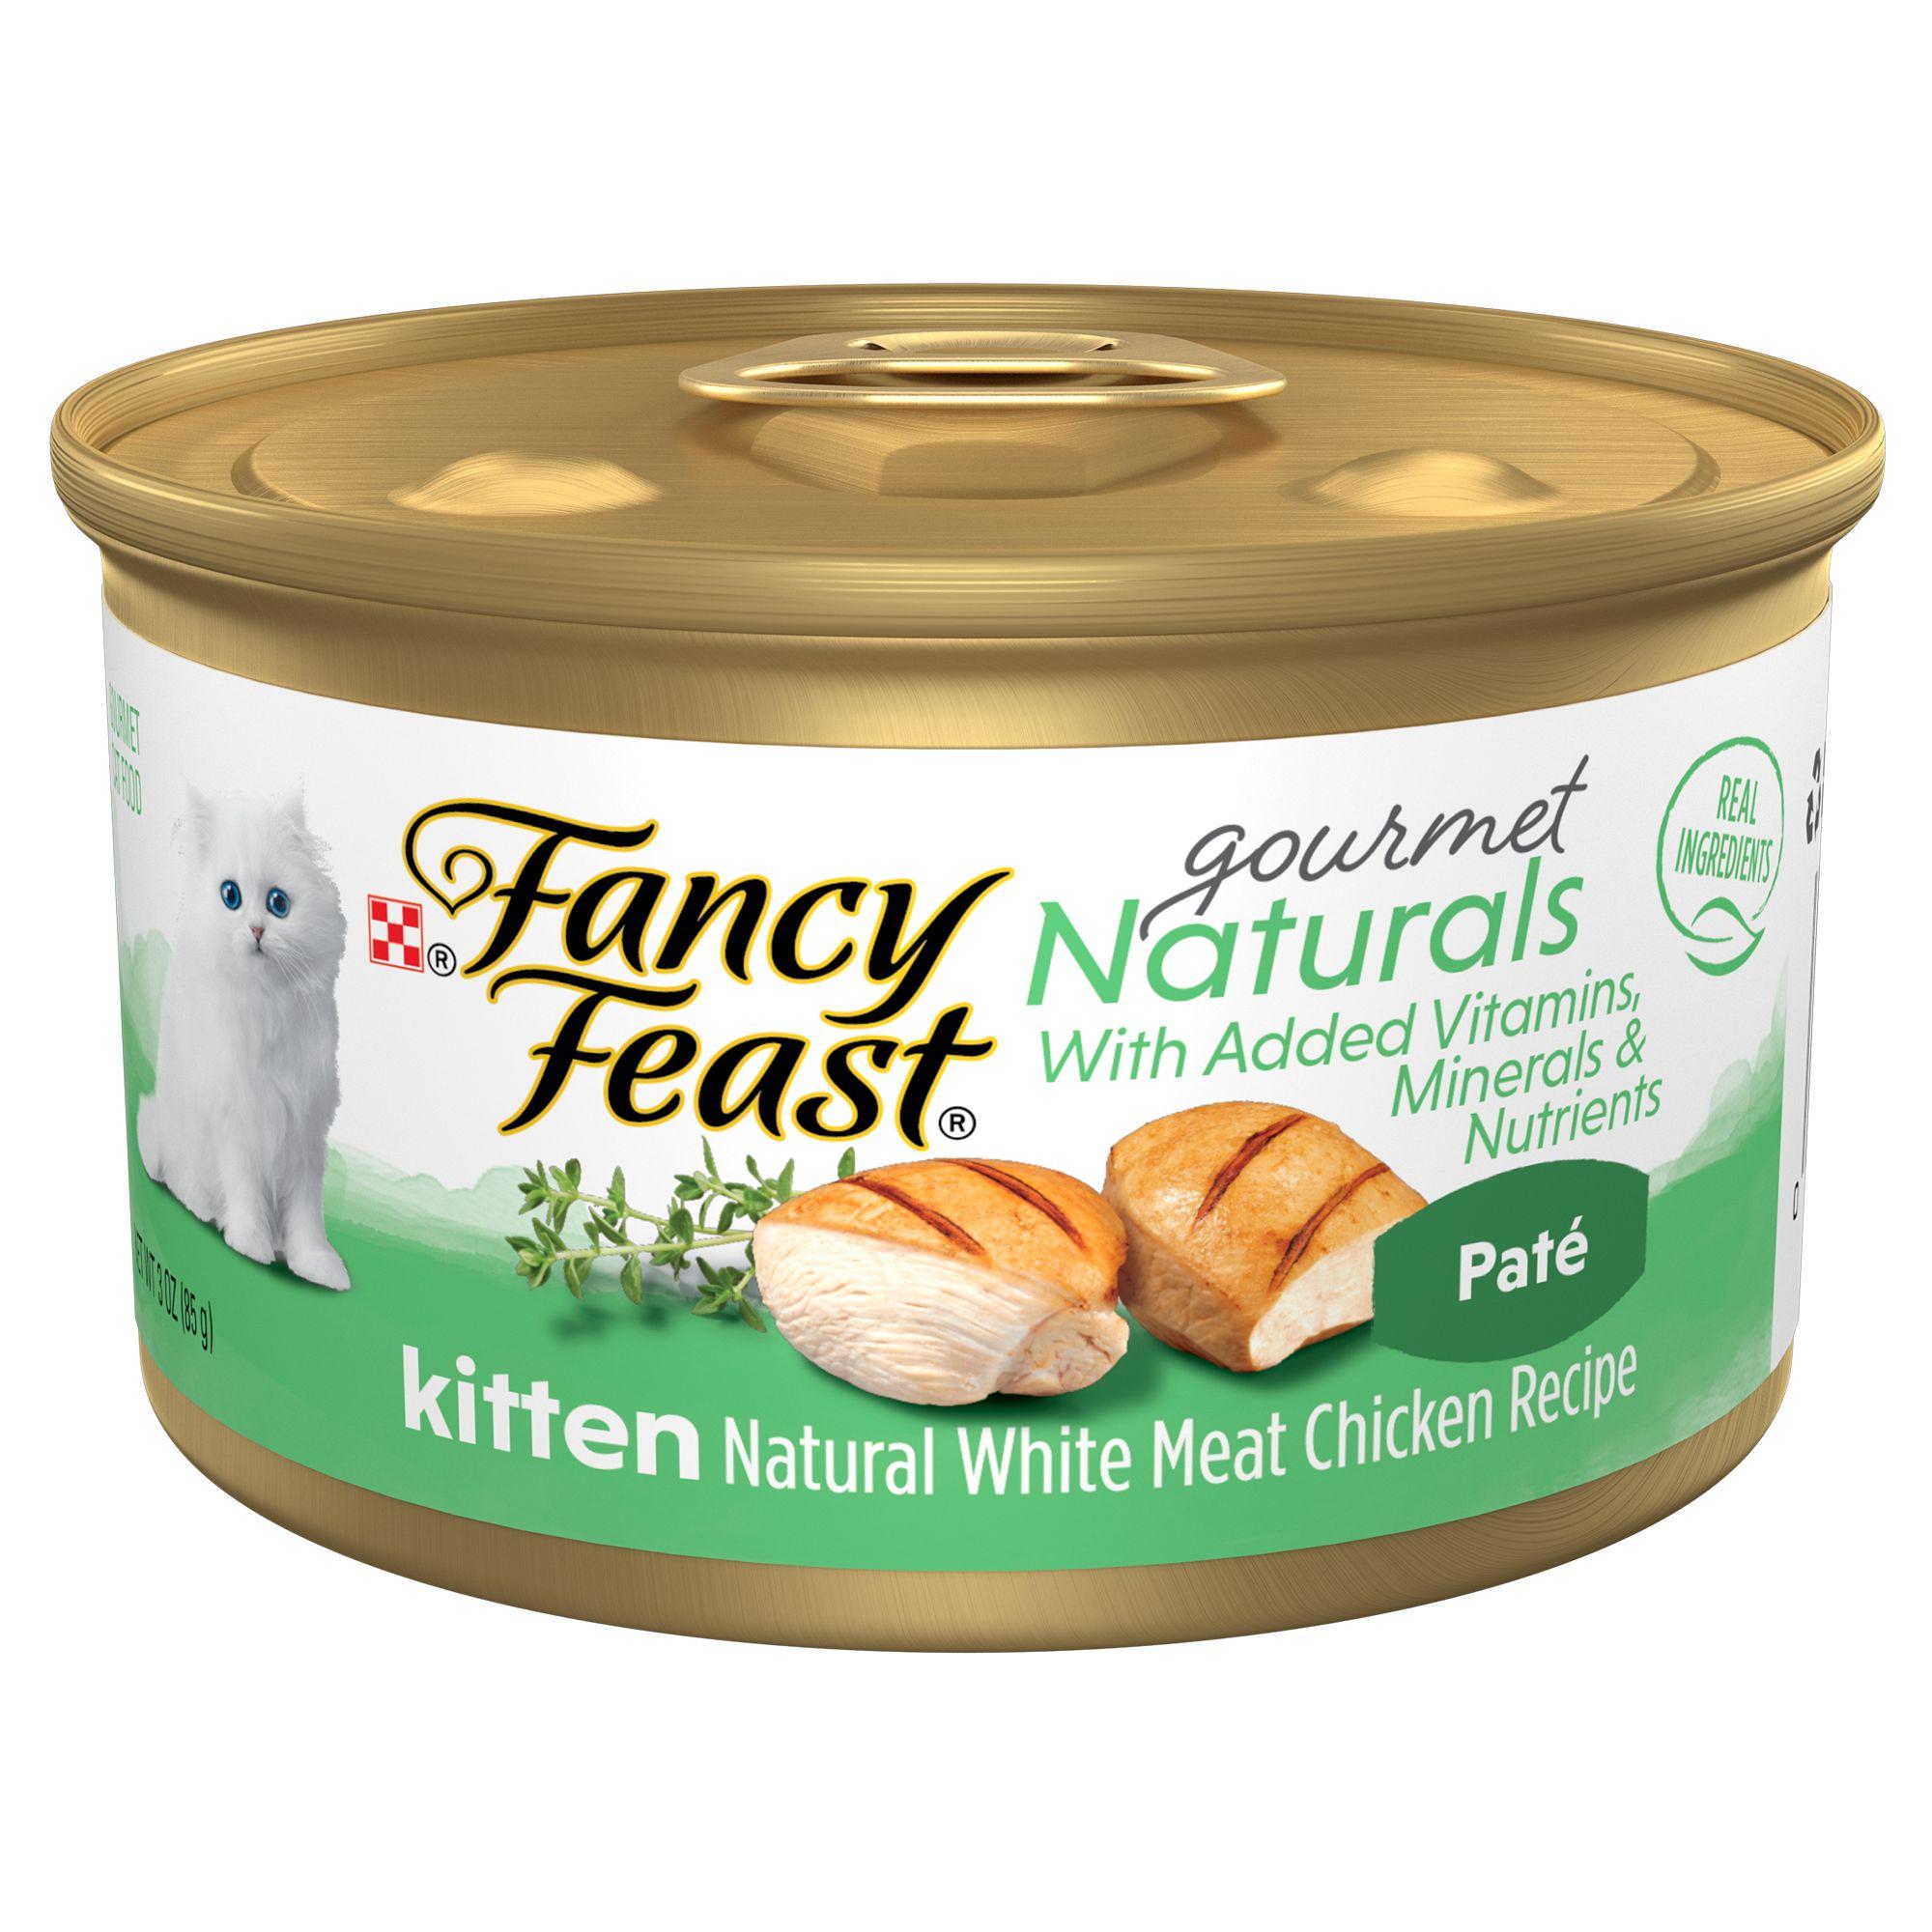 Fancy Feast Gourmet Naturals Kitten Cat Food Natural Grain